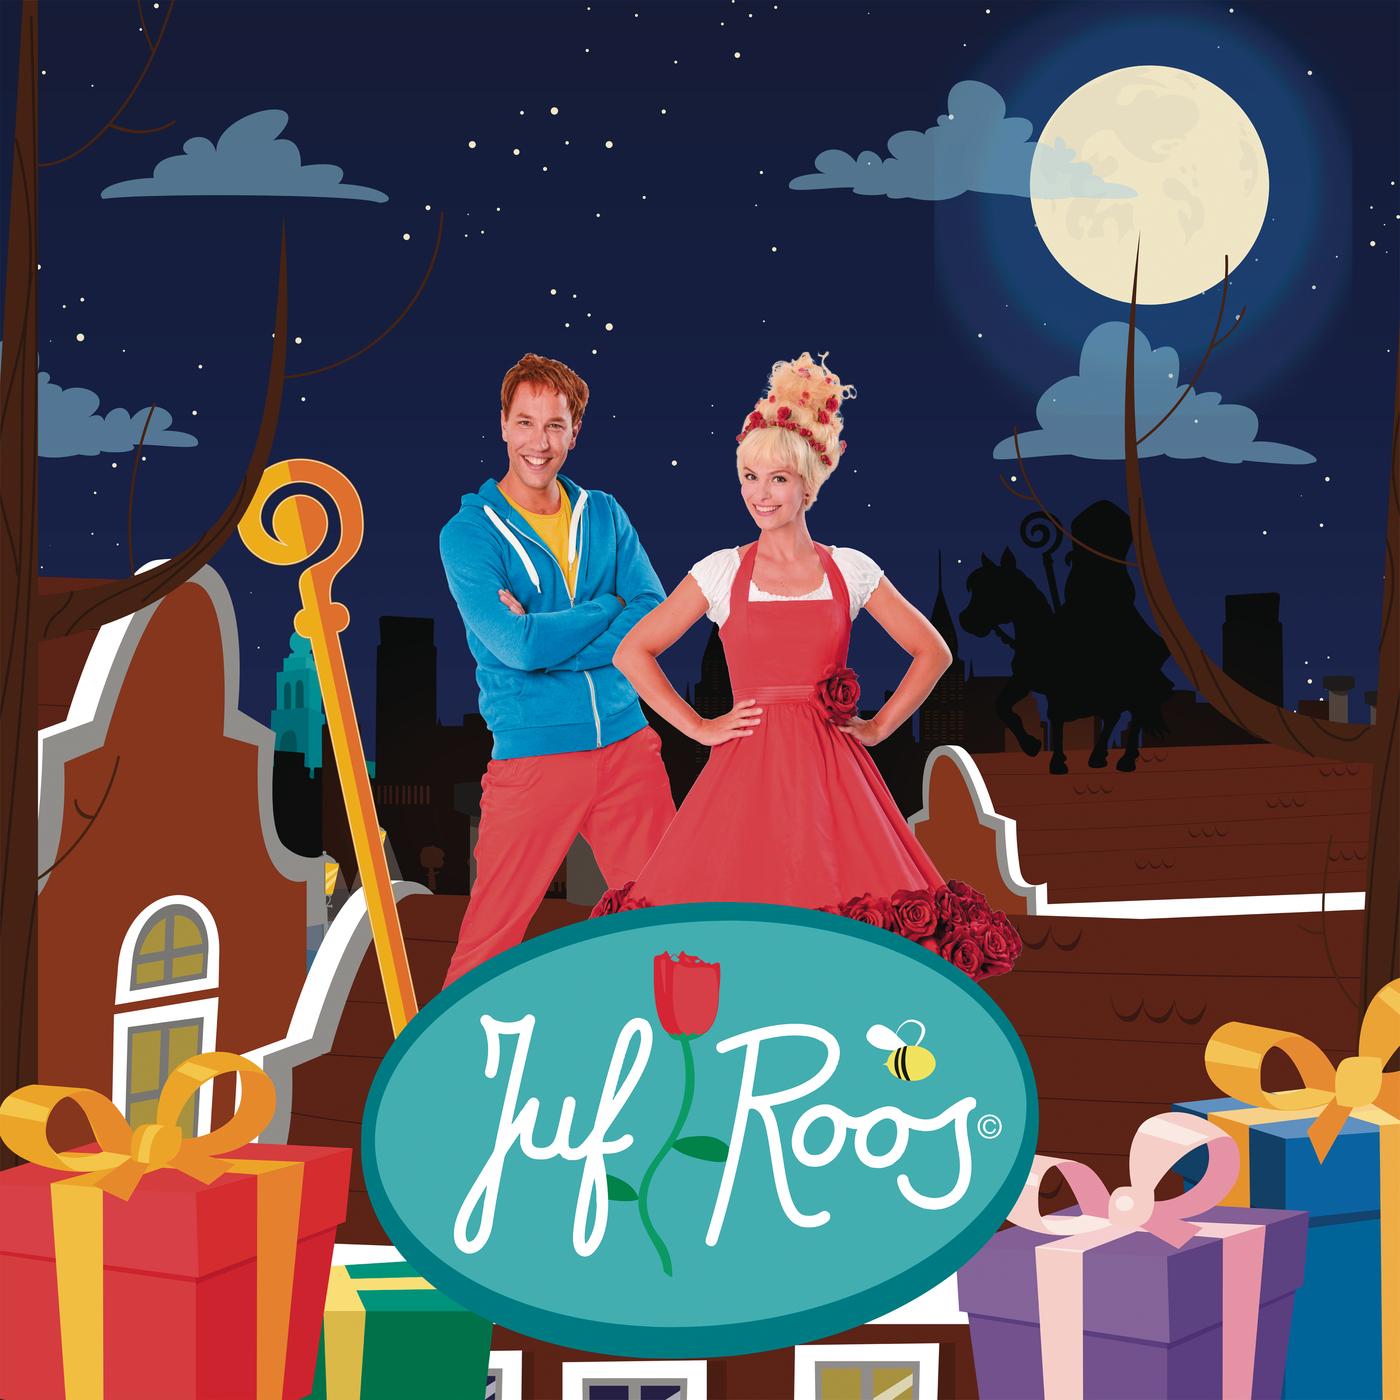 Sinterklaas - Juf Roos